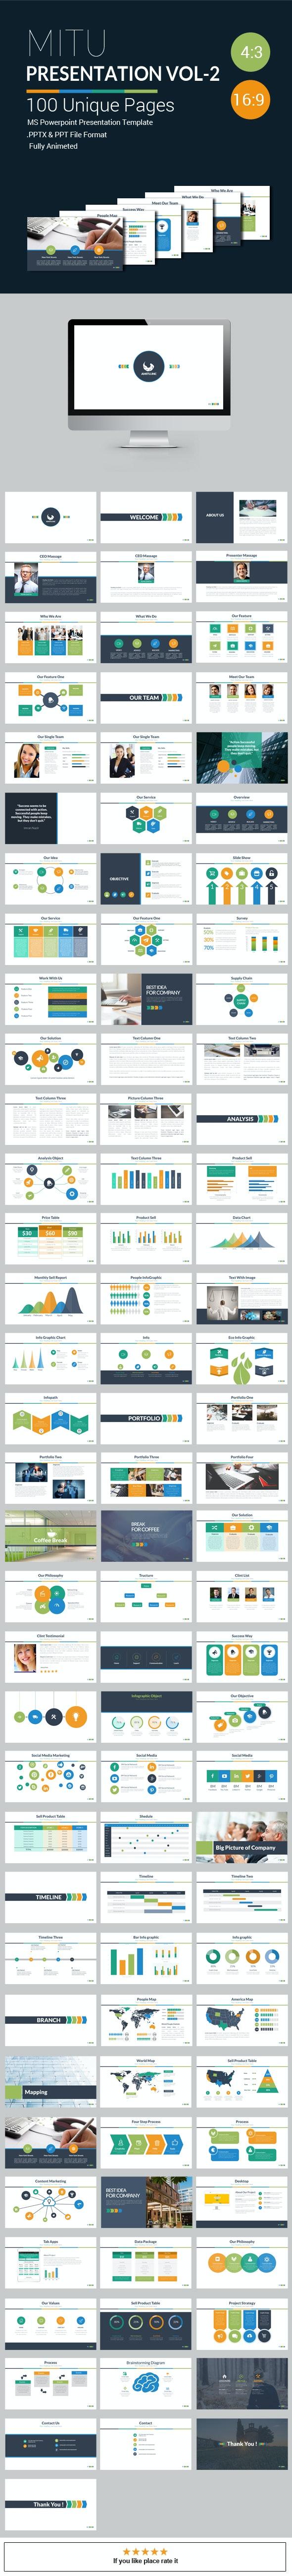 Mitu Powerpoint Presentation Template Vol - 2 - Creative PowerPoint Templates